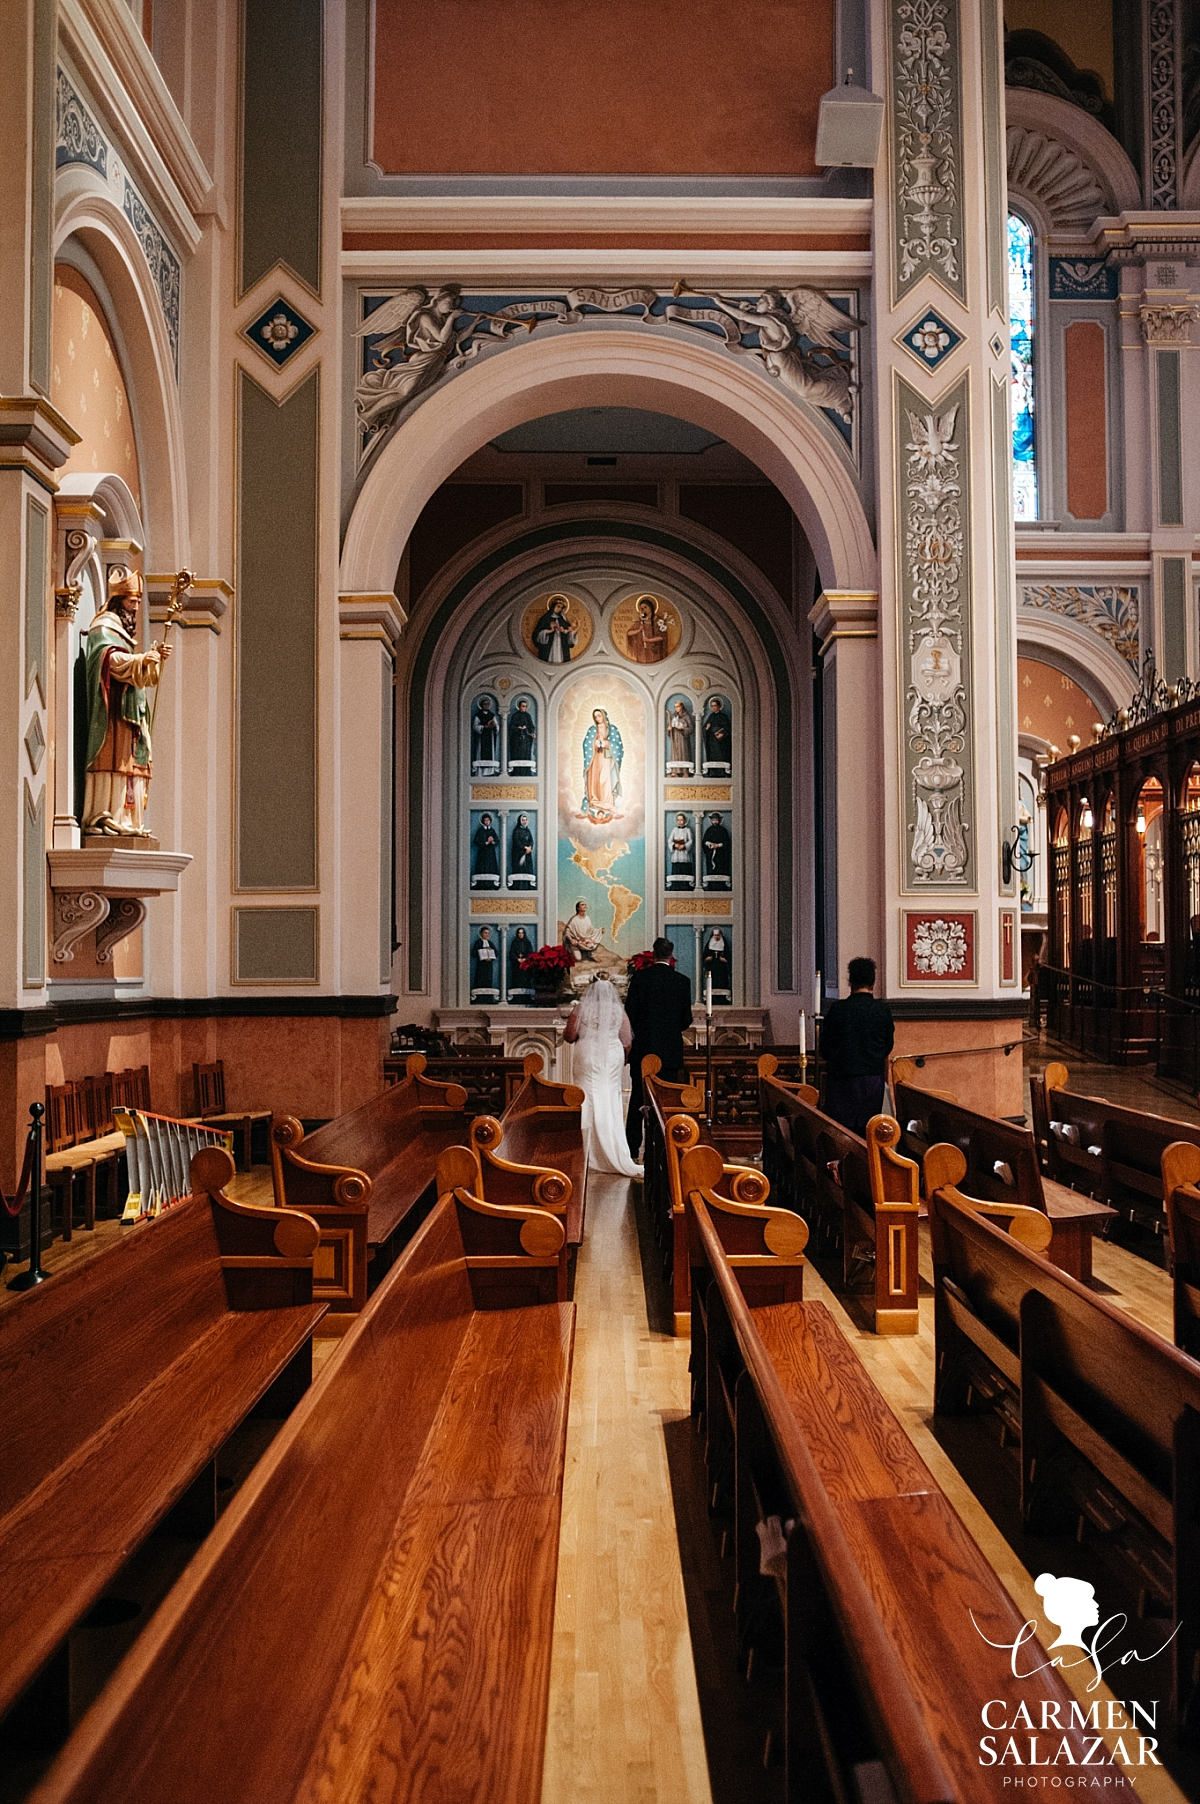 Wedding prayer to Mother Mary - Carmen Salazar